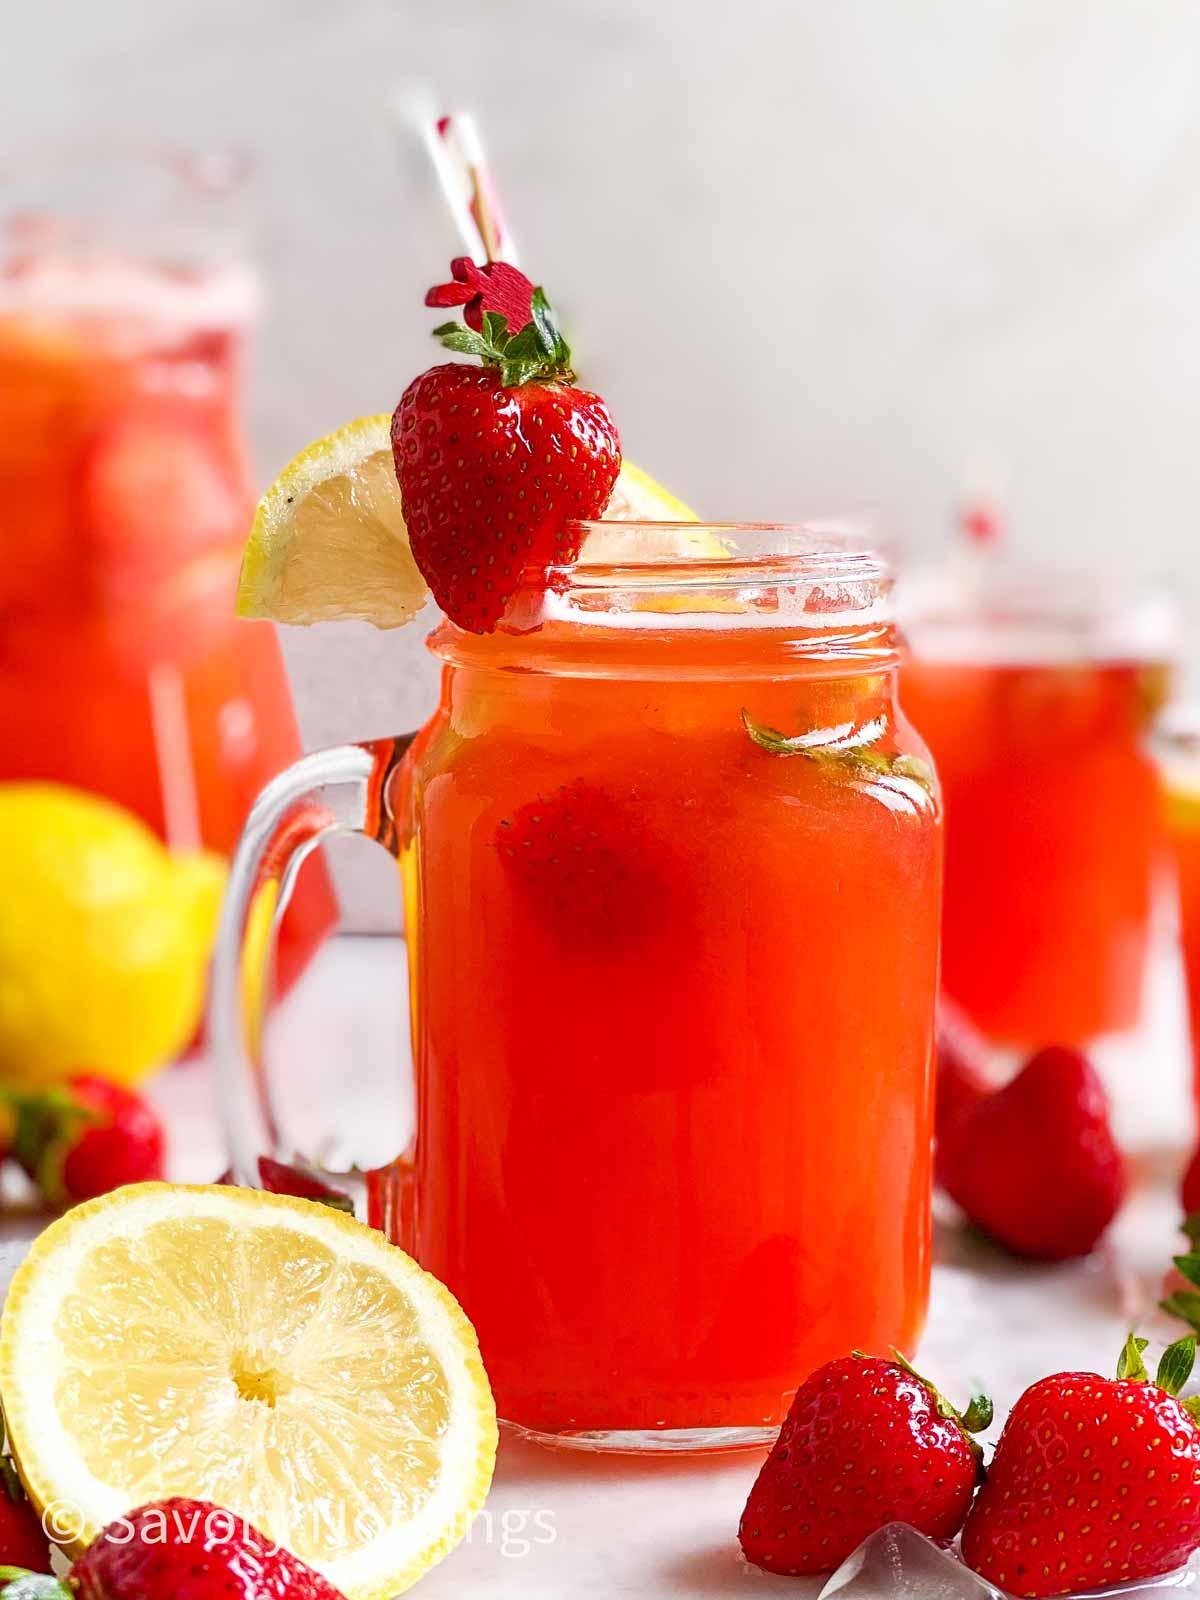 mason jar filled with strawberry lemonade and garnished with straws, fresh strawberries, ice and lemon